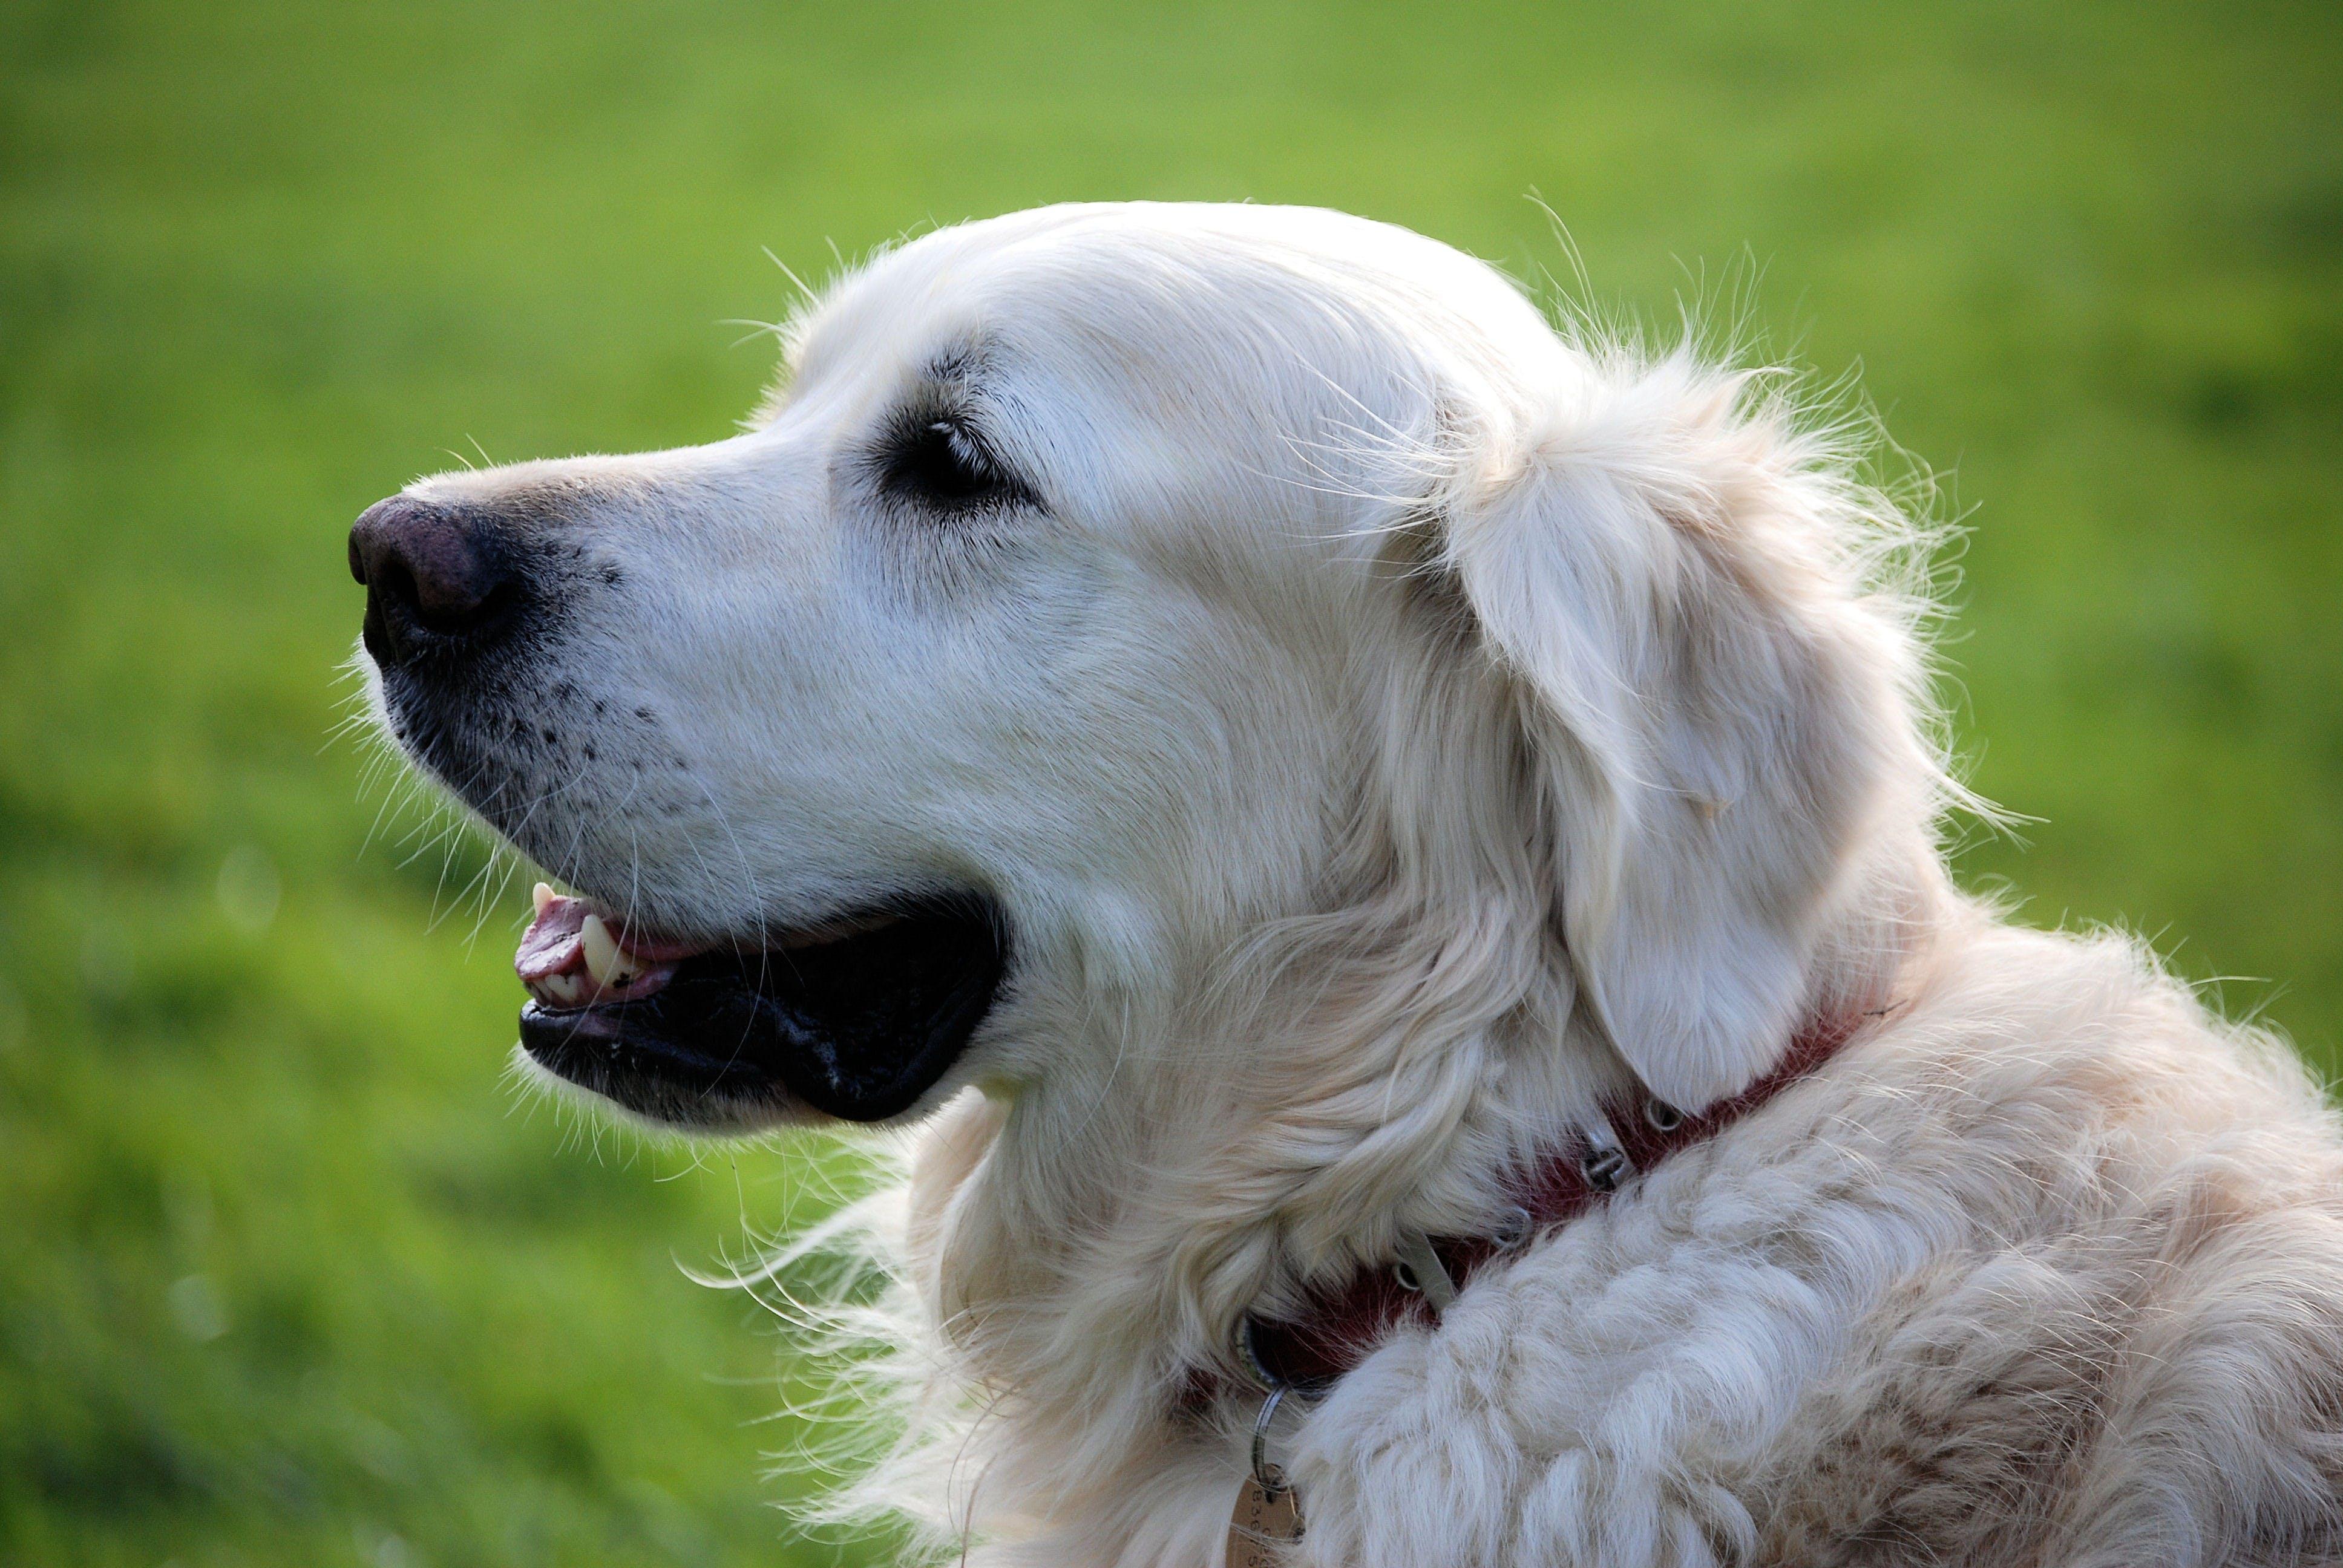 Golden Retriever Dog Wearing Red Collar